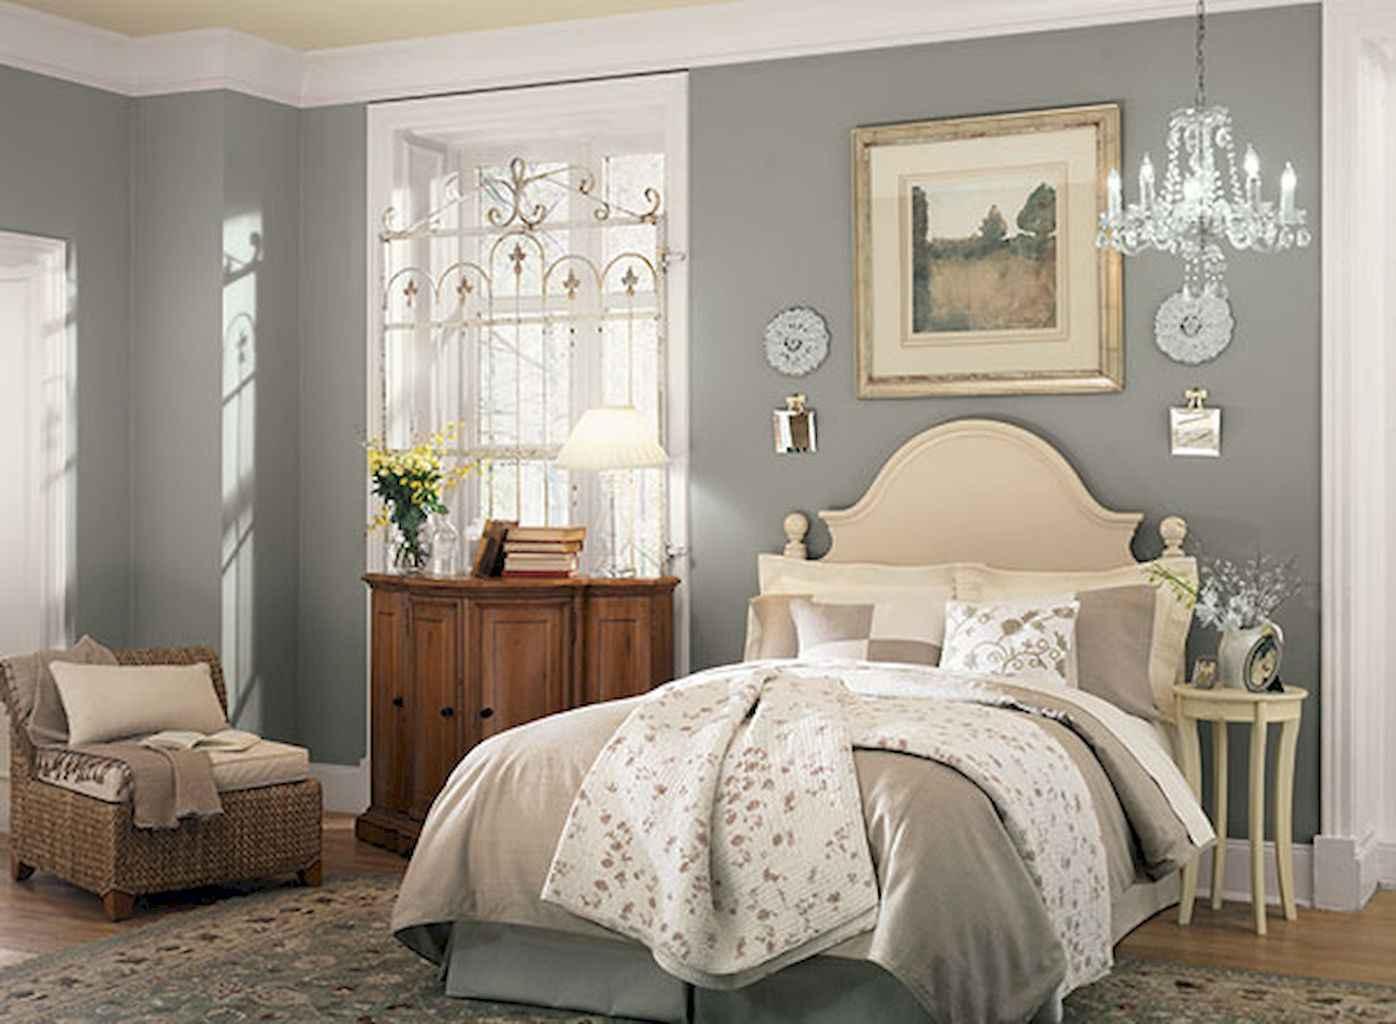 100 Stunning Farmhouse Master Bedroom Decor Ideas (46)